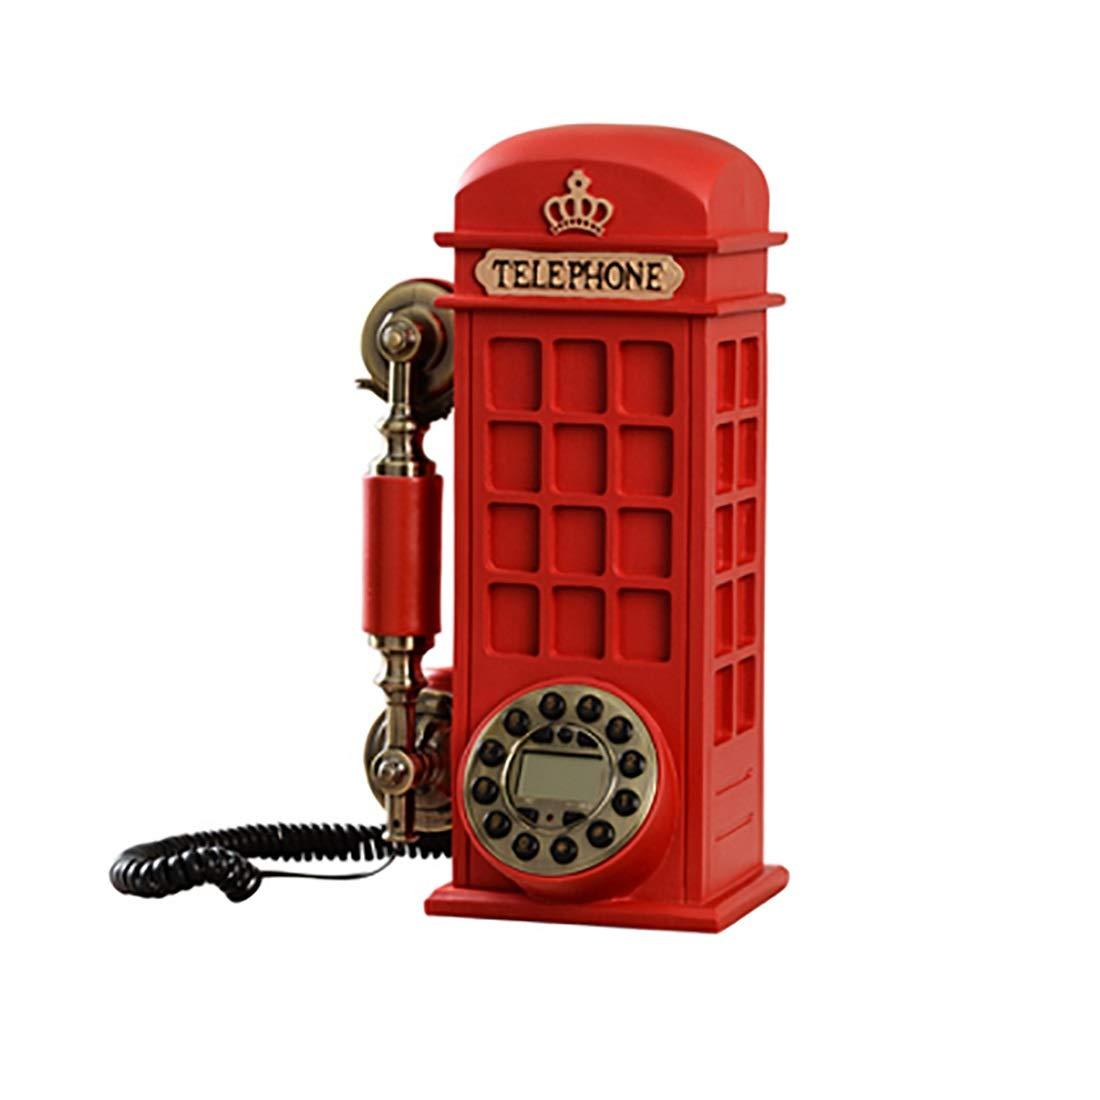 ZHILIAN Red Personality Creative Phone Booth European Retro Fixed Telephone Family Landline